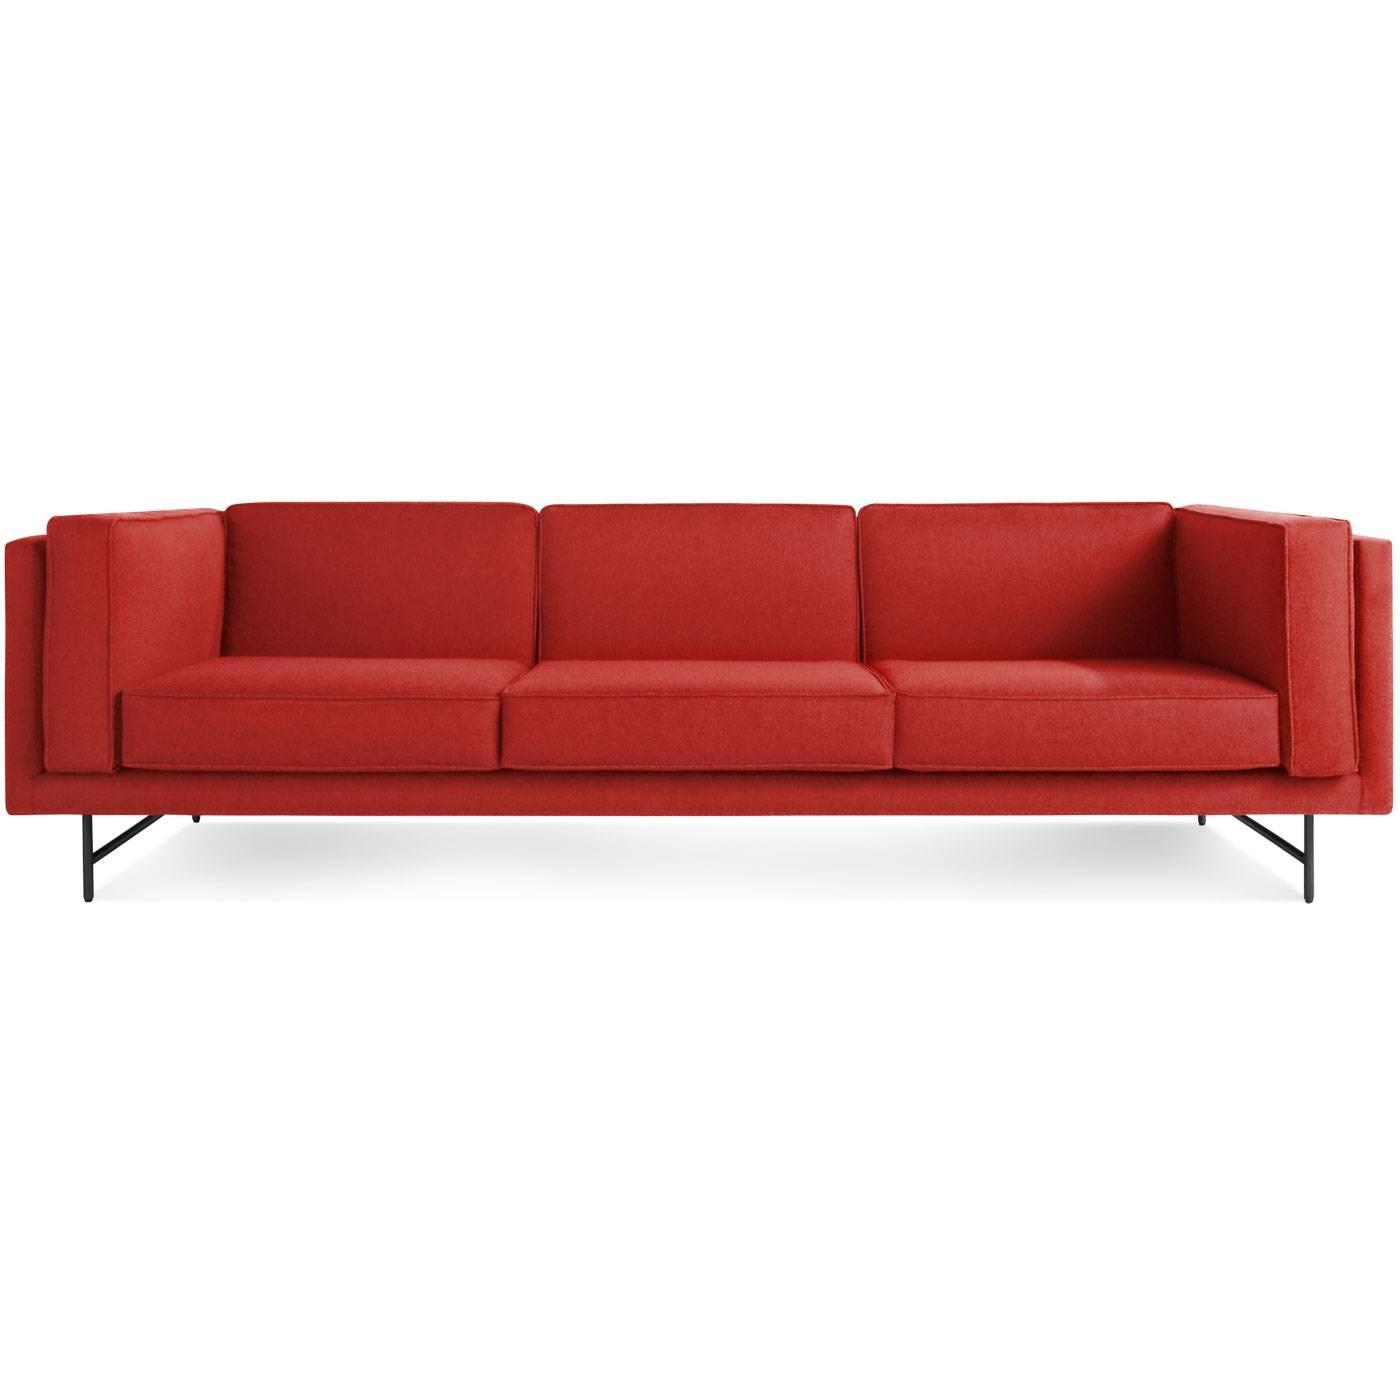 "Bank 96"" Deep Seat Sofa - Low Profile Sofa | Blu Dot regarding Brick Sofas (Image 7 of 30)"